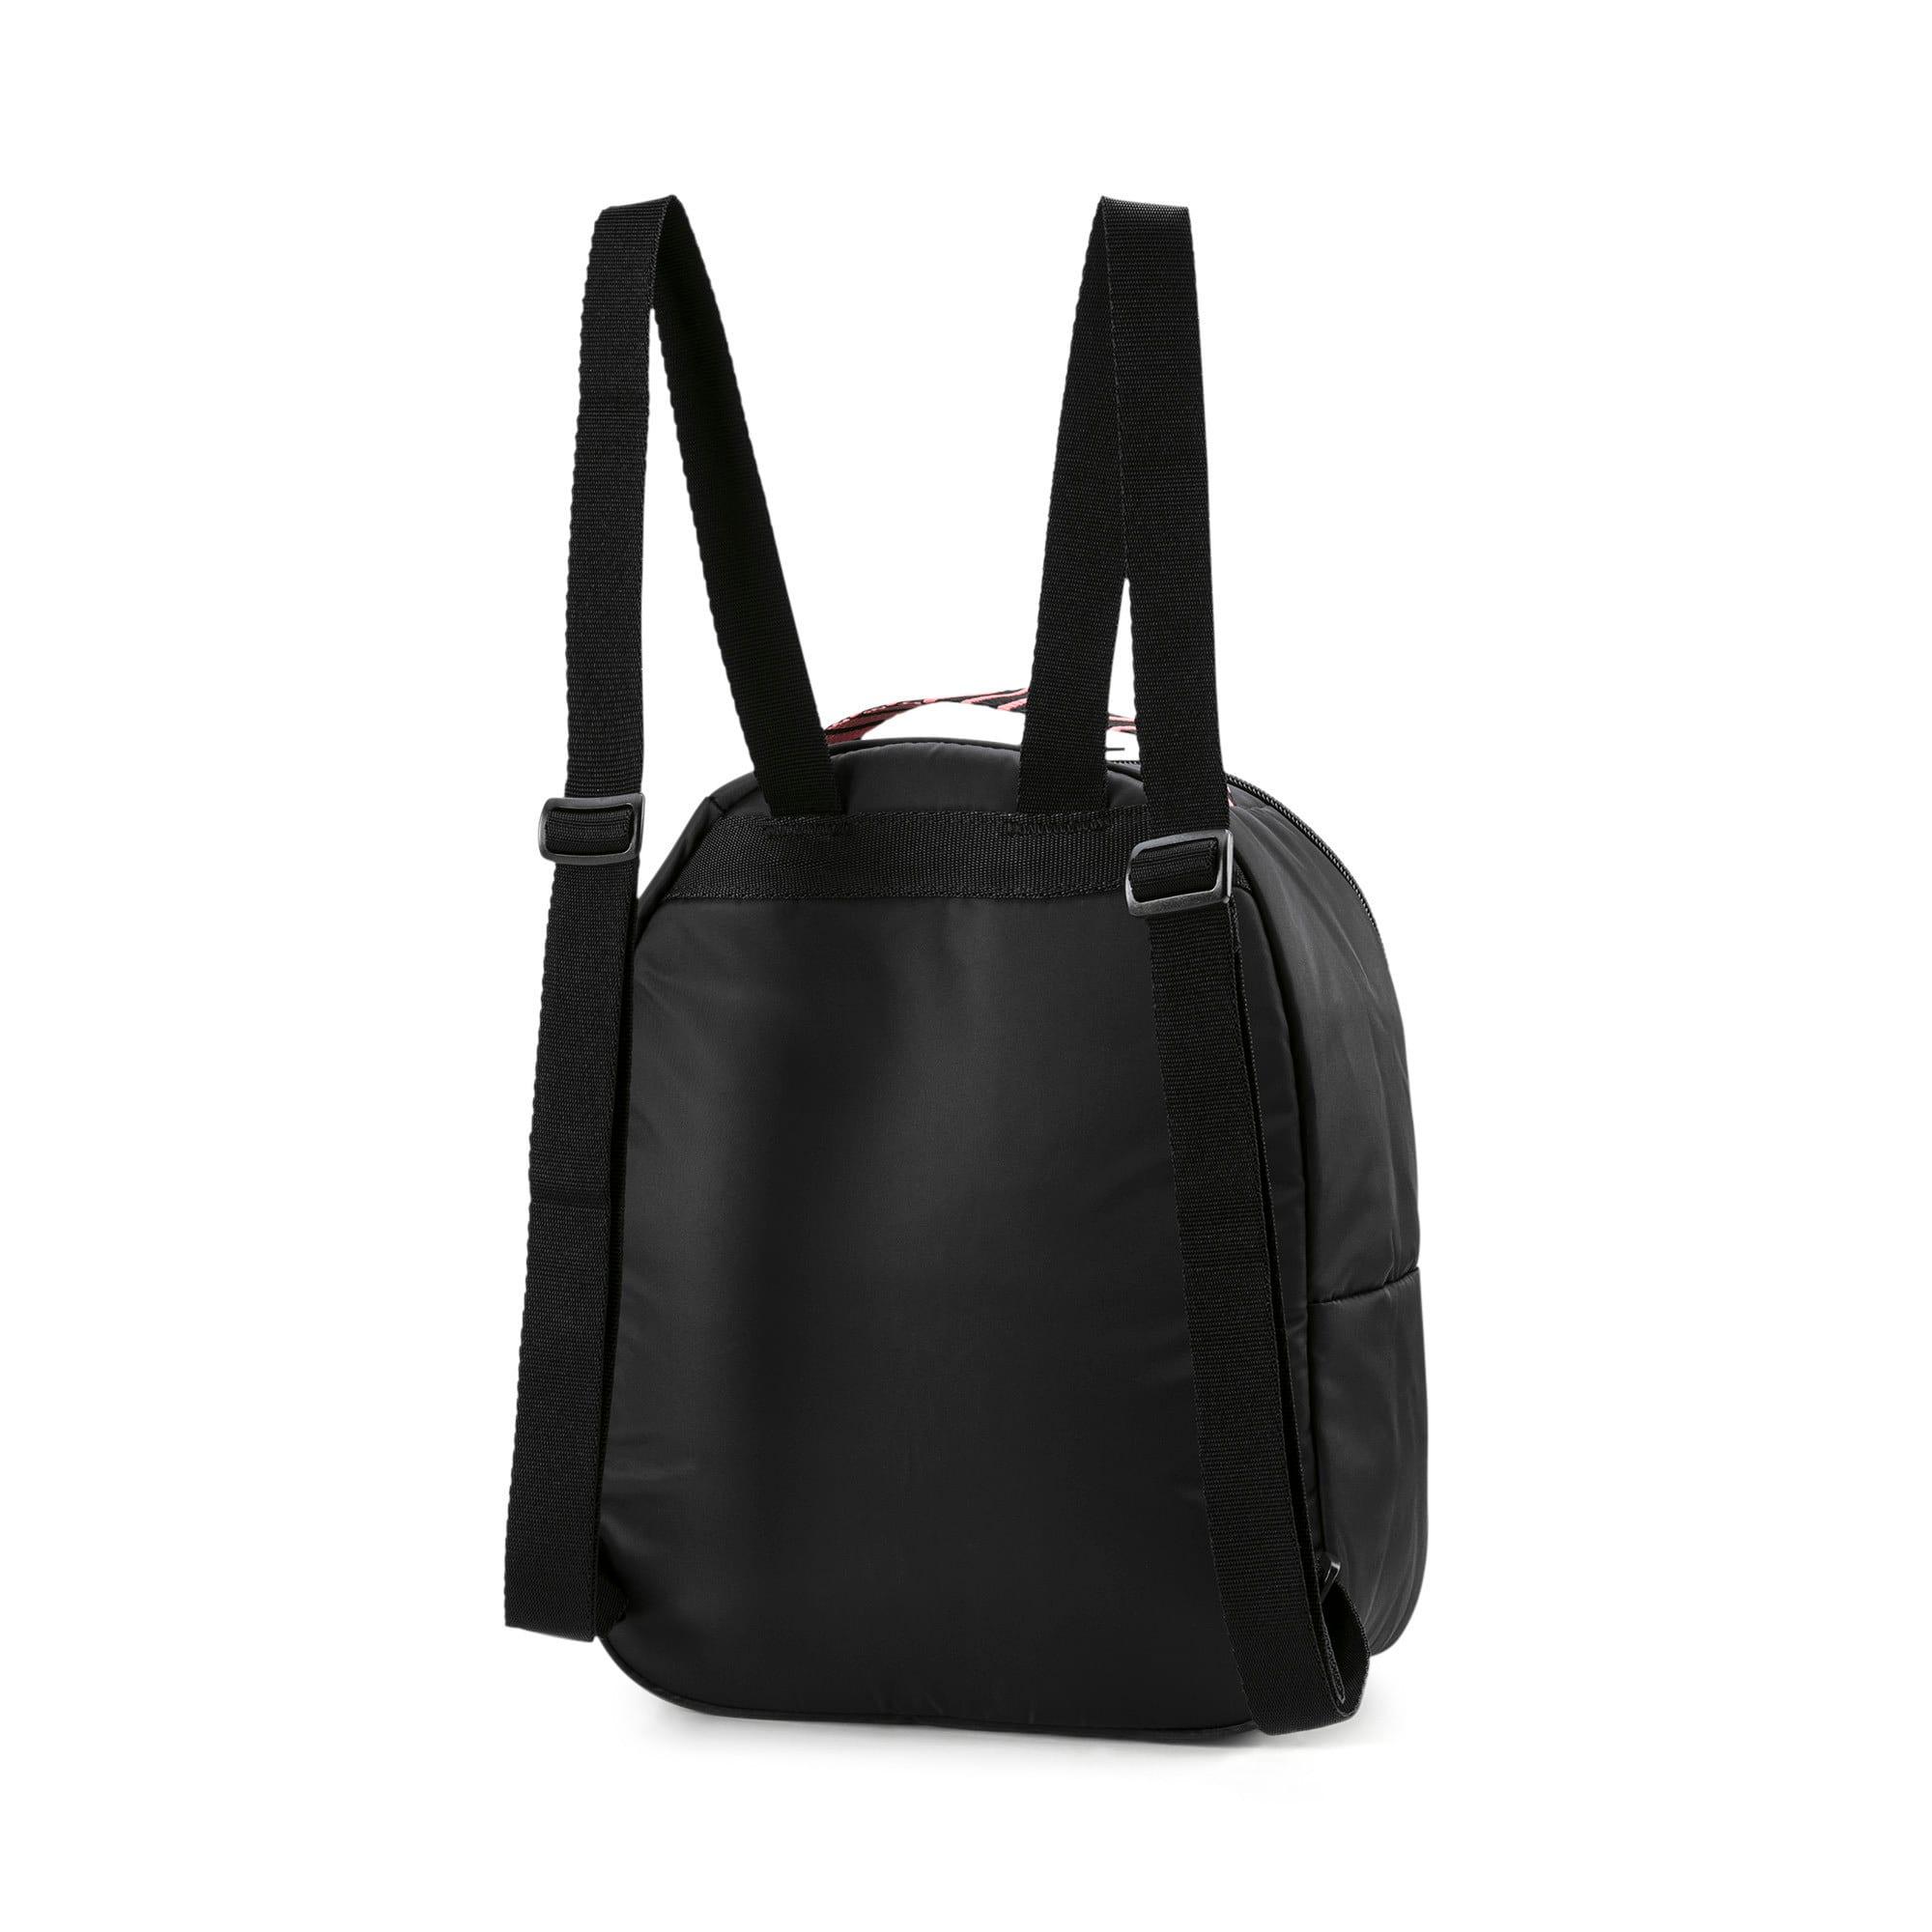 Thumbnail 2 of PUMA x SUE TSAI Backpack, Puma Black, medium